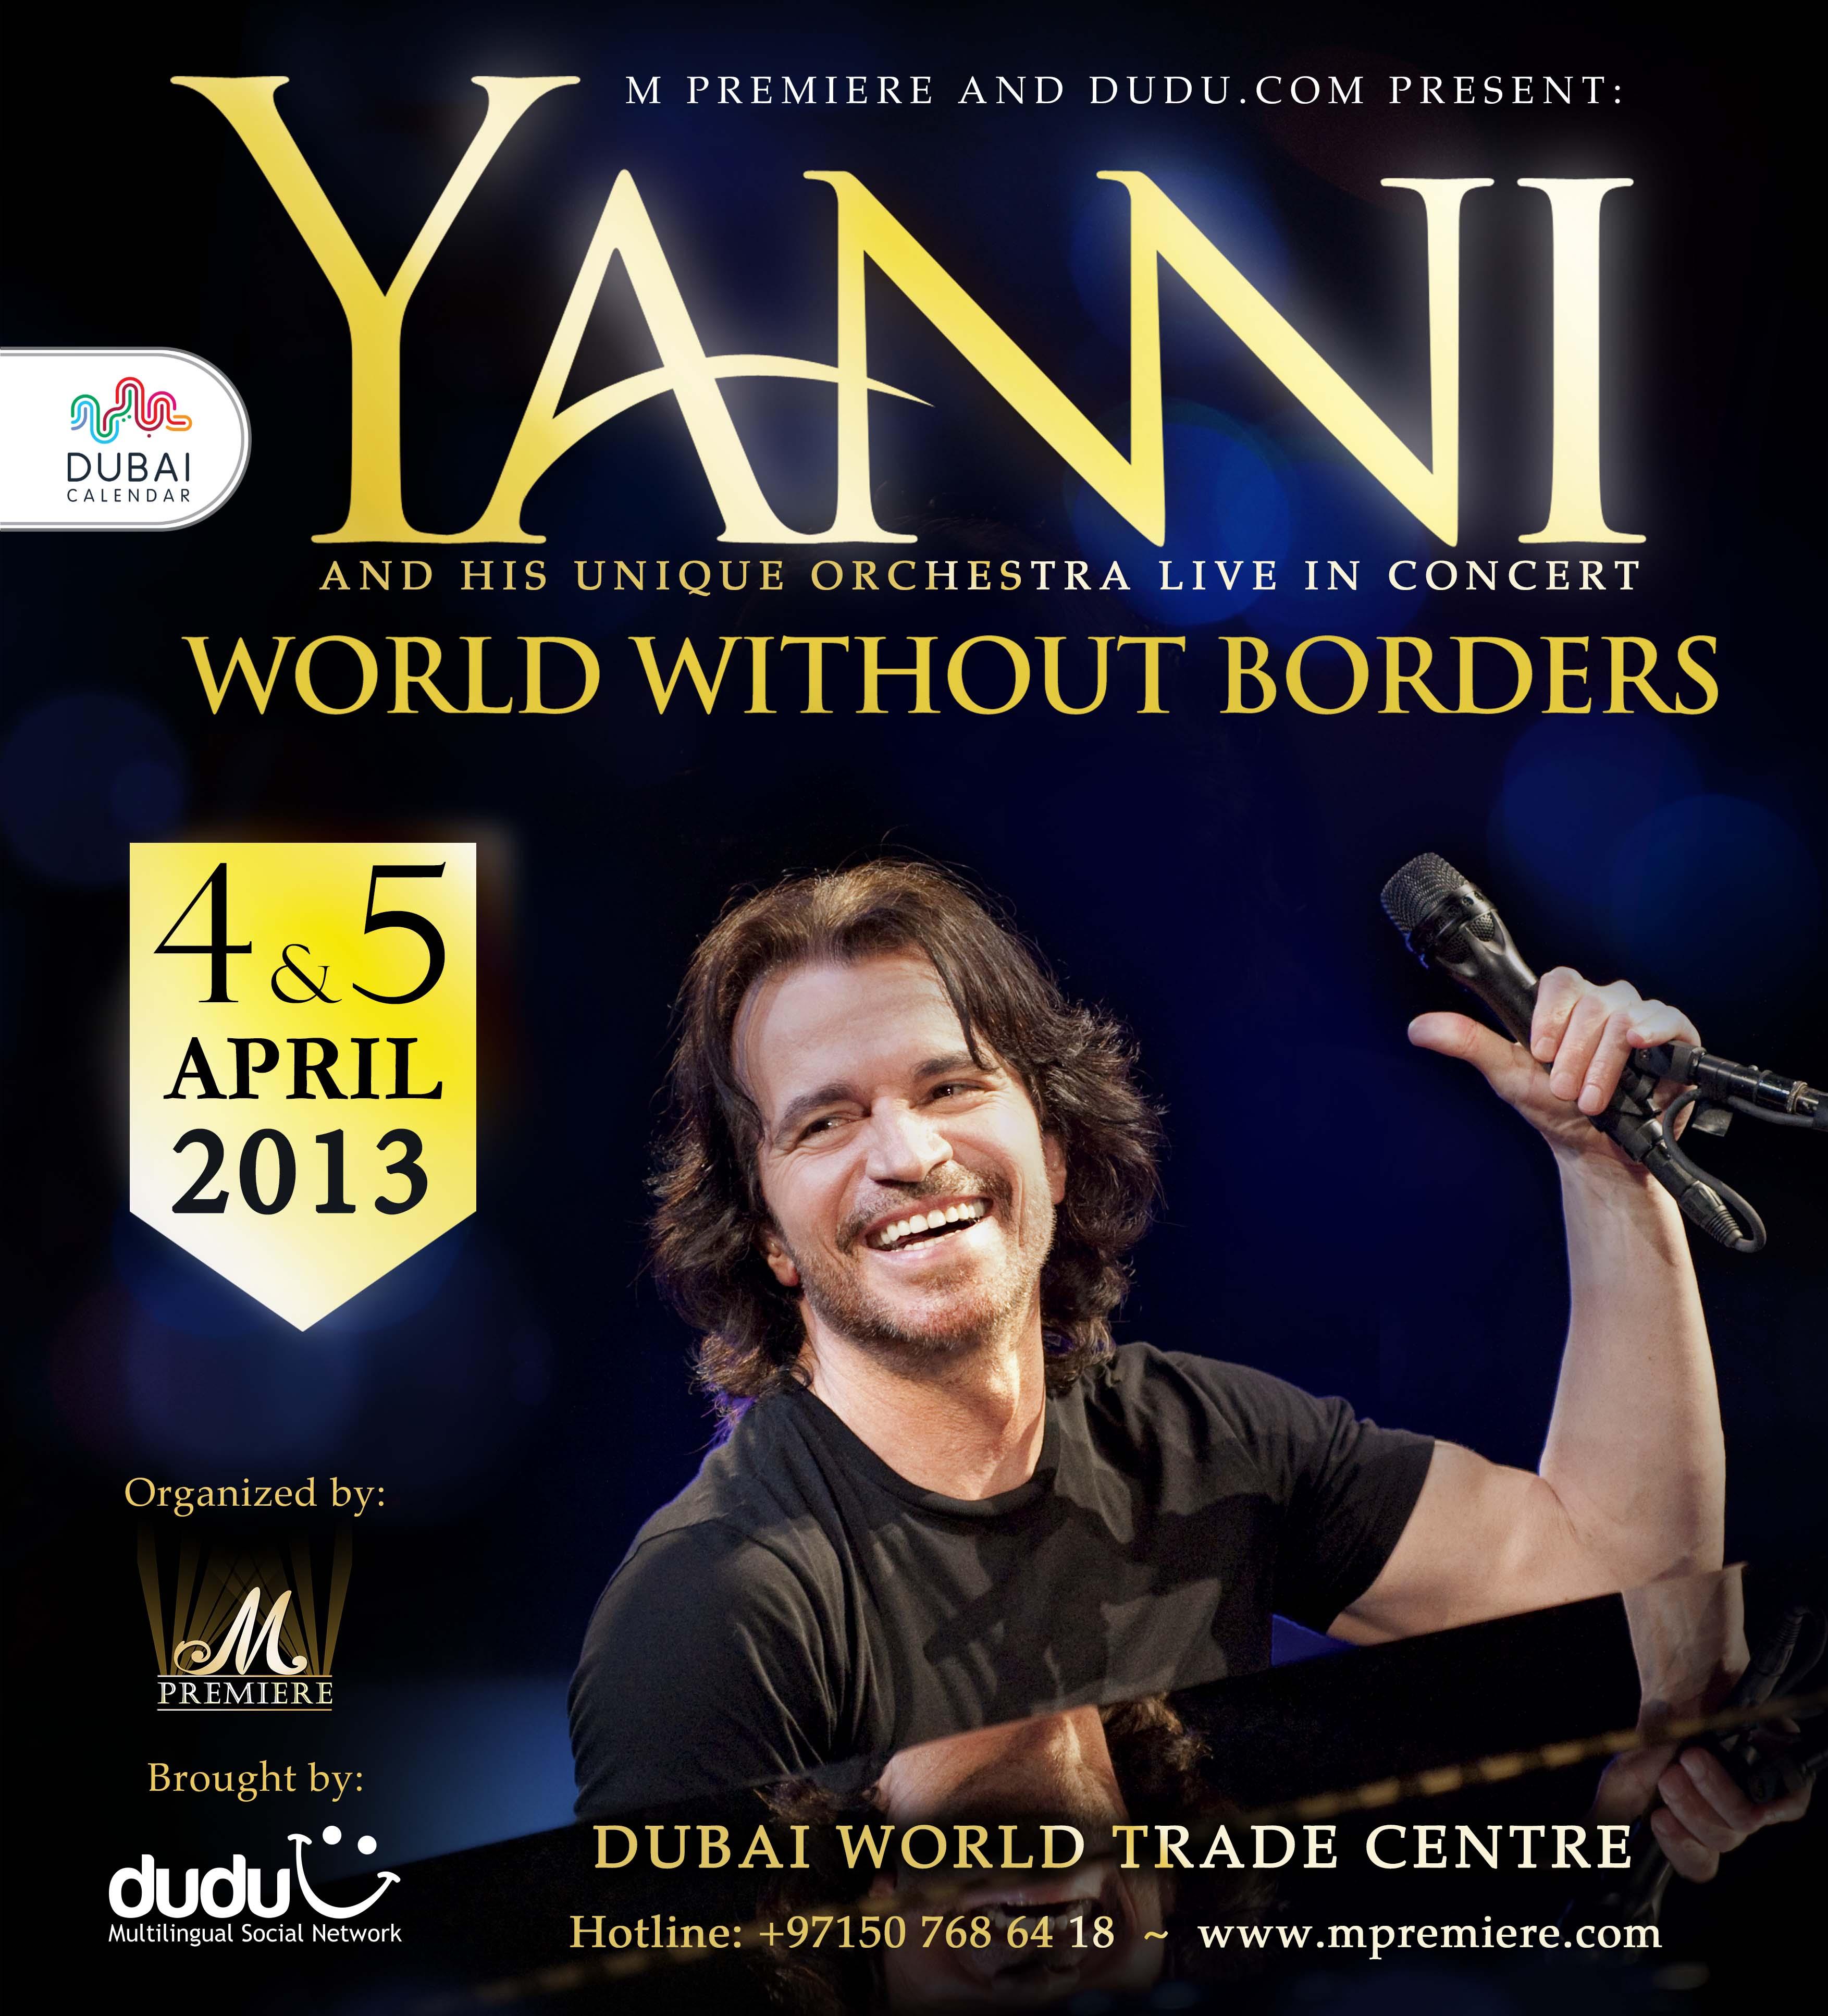 Yanni live!the concert event